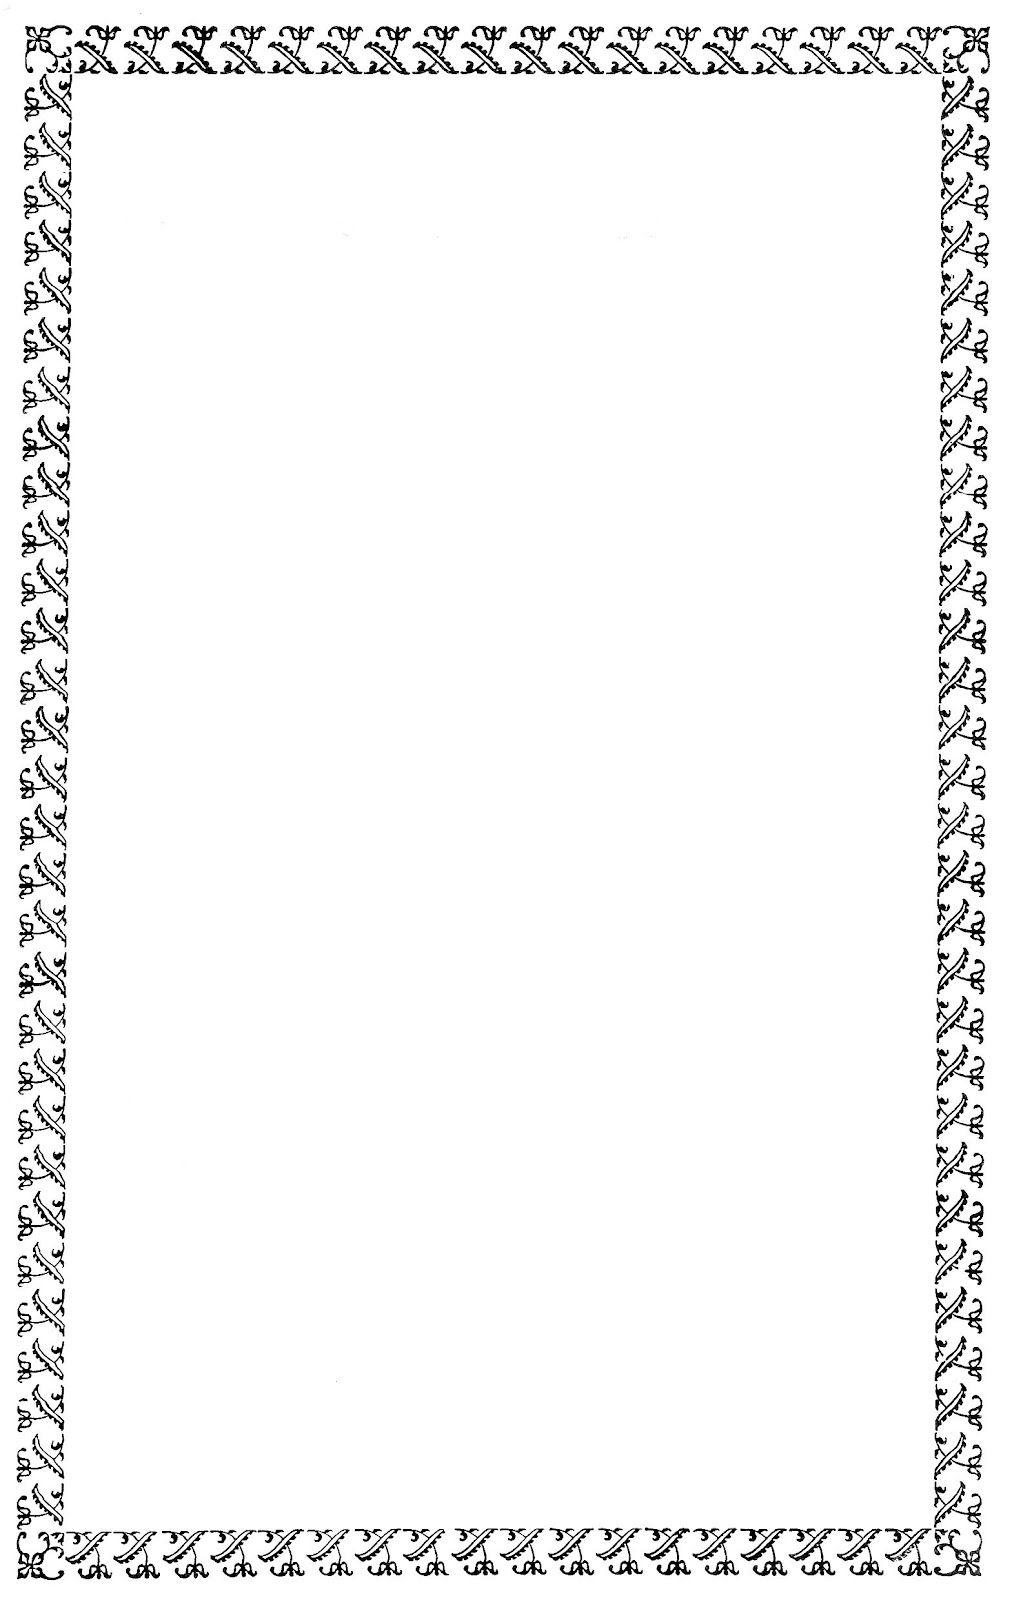 Free Digital Frame Black Decorative Border Clip Art Clip Art